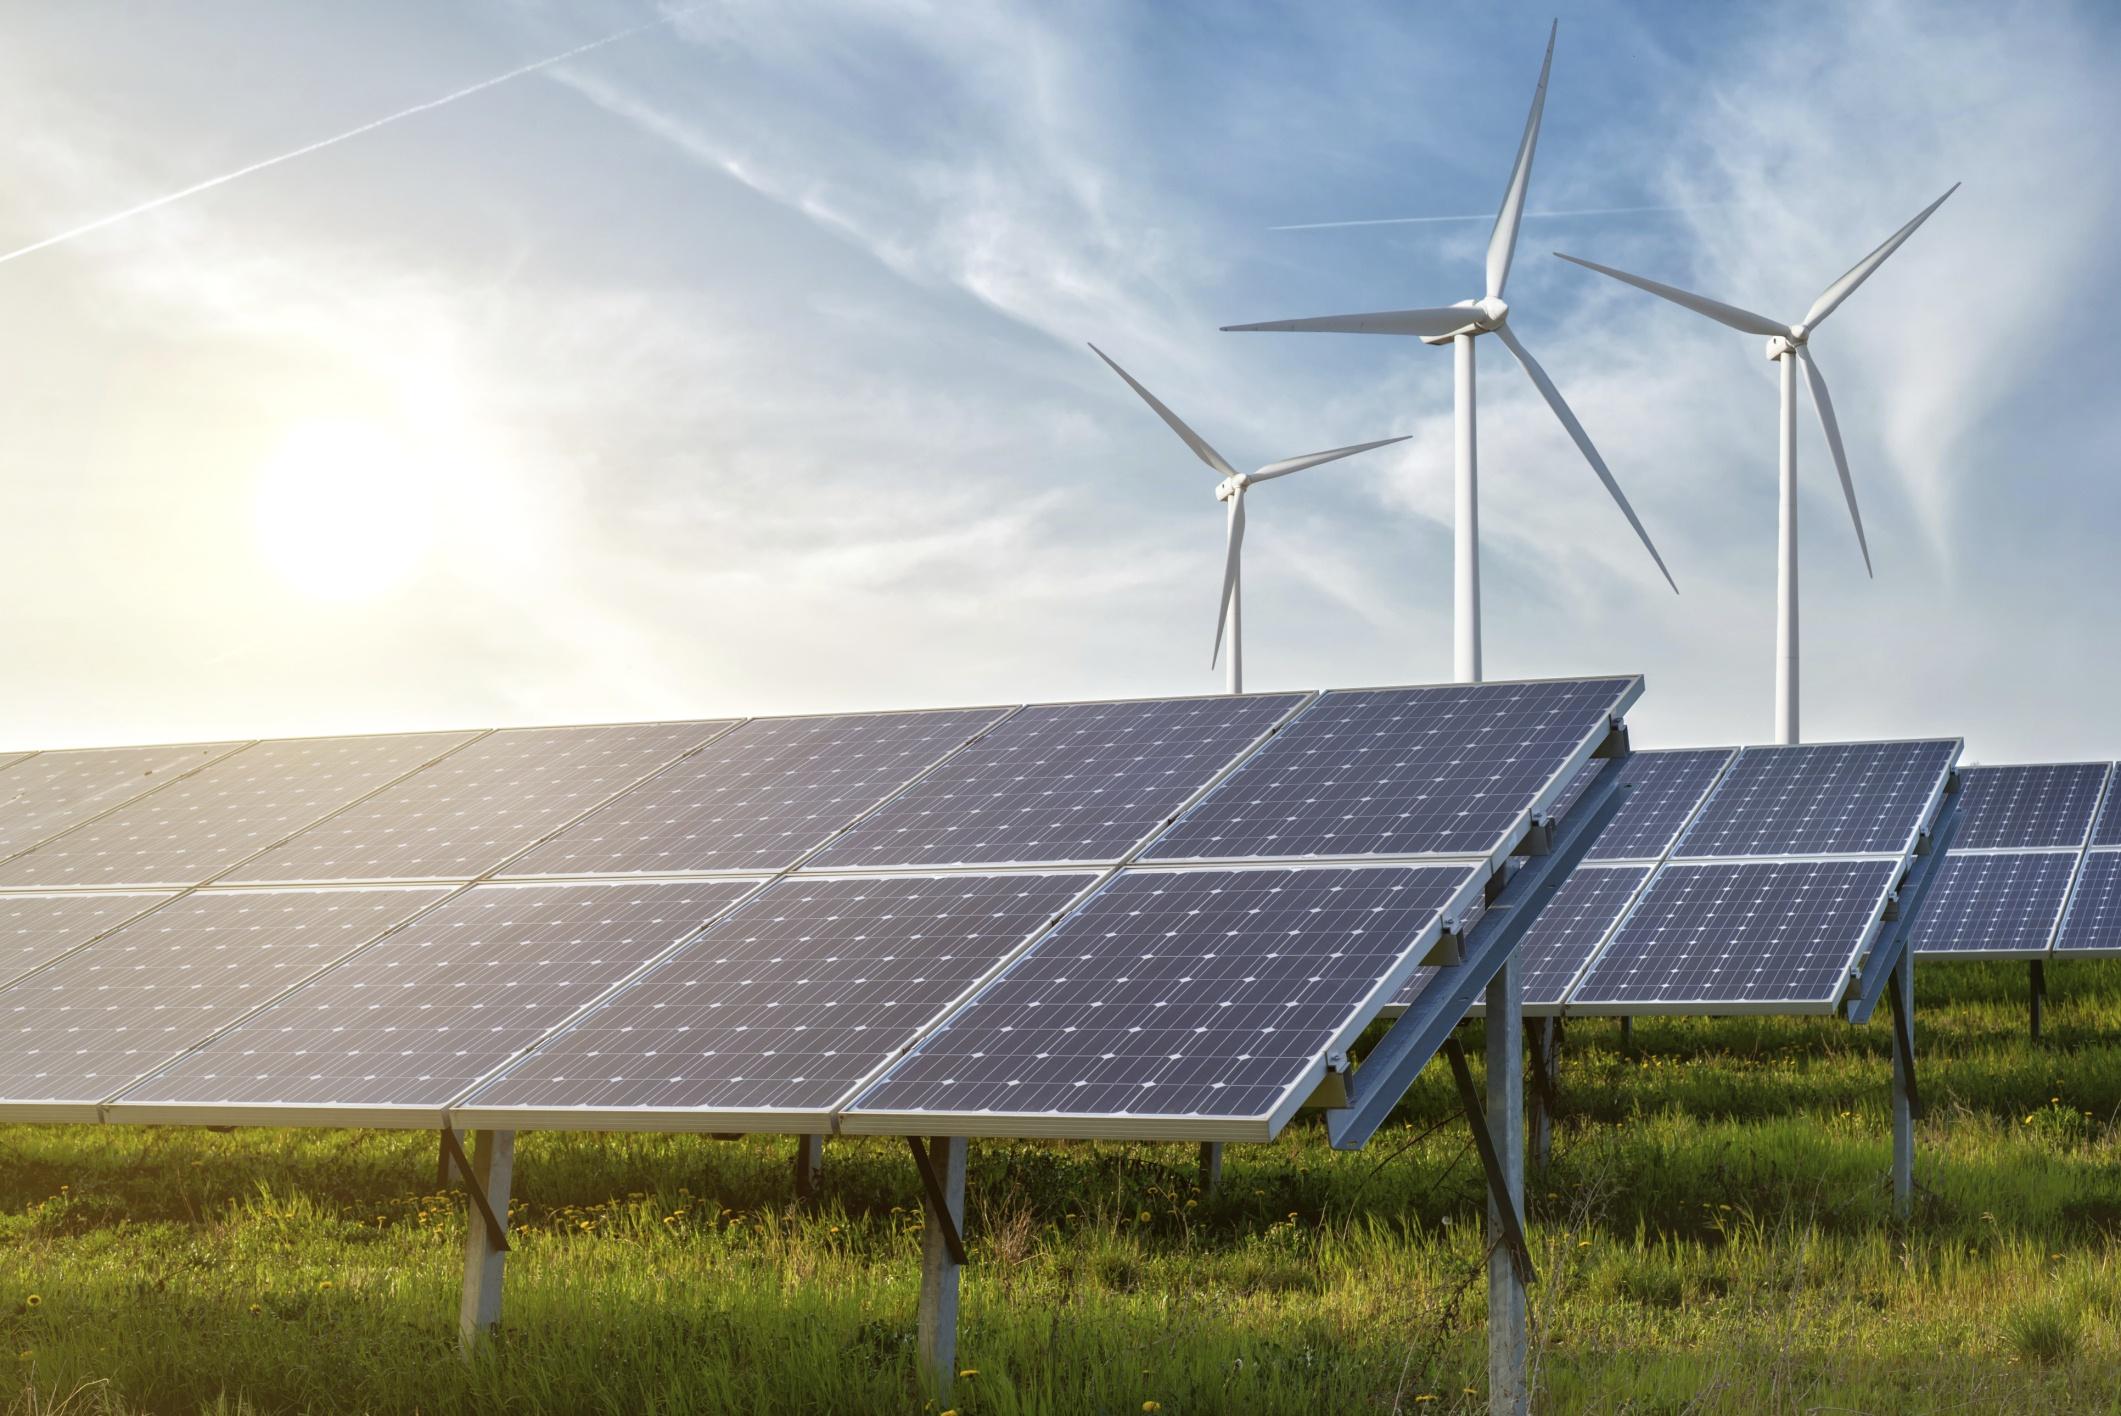 Solar_Panels_and_Wind_Farm.jpg